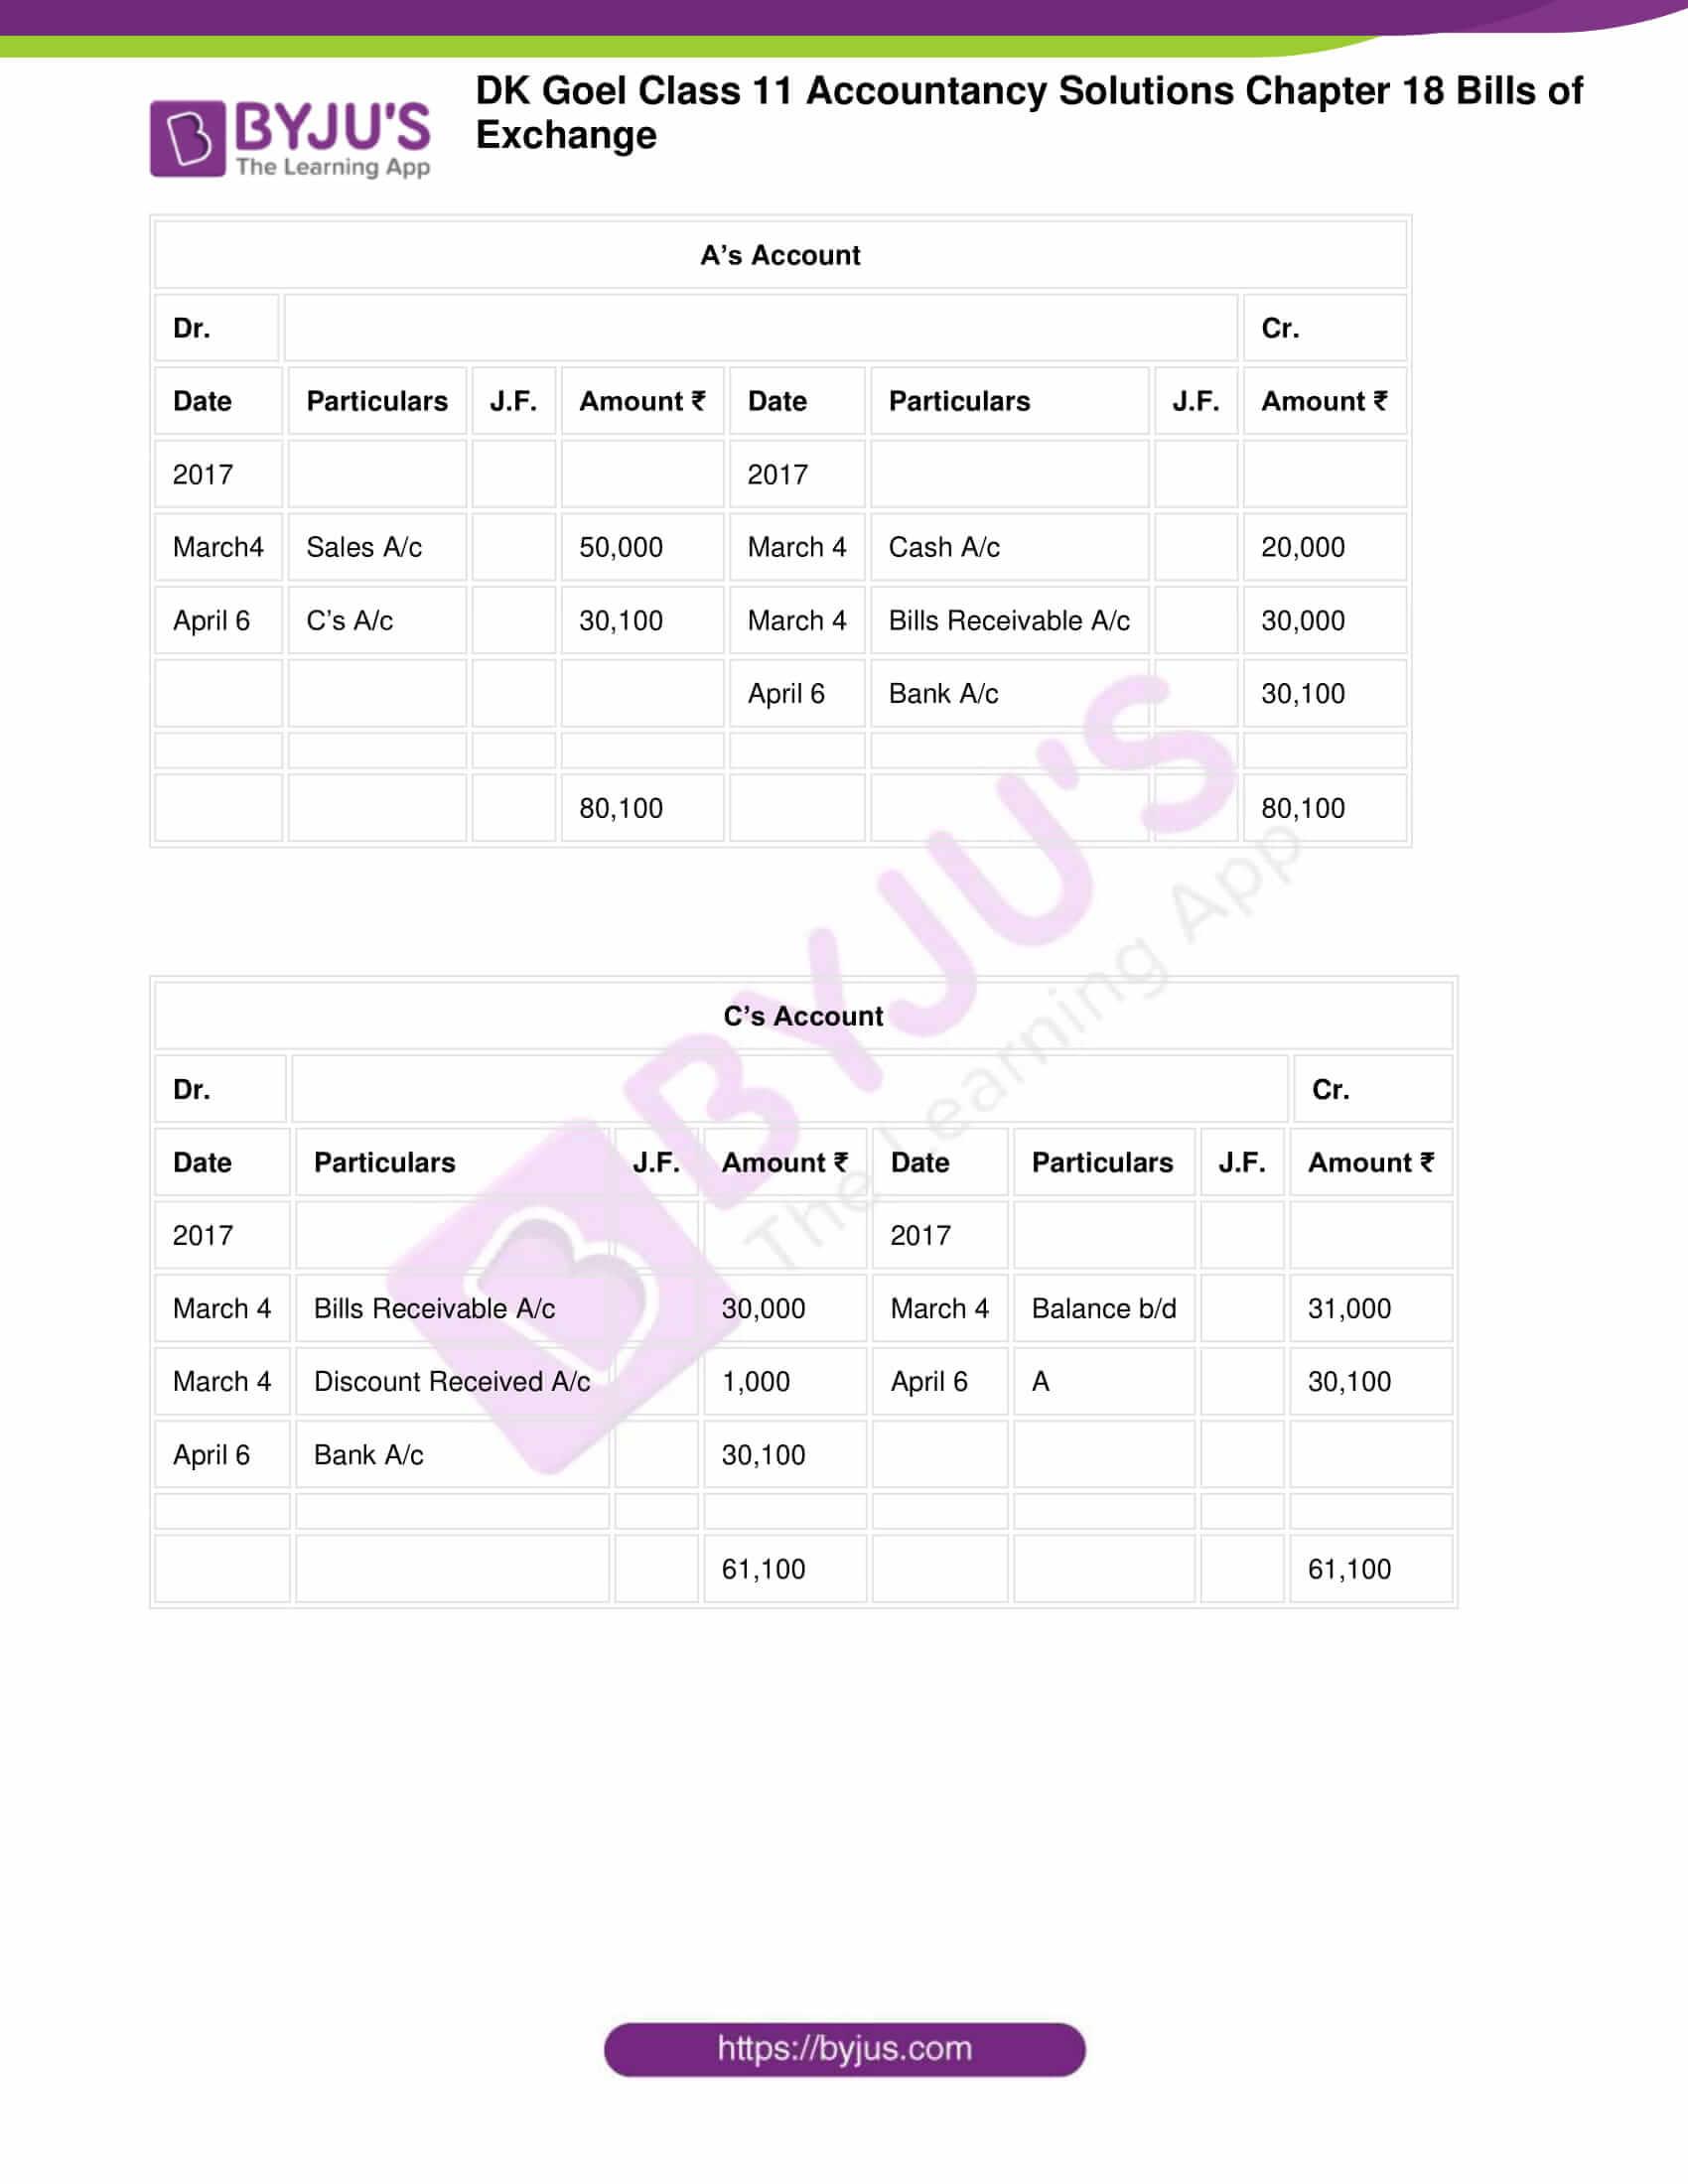 dk goel class 11 accountancy solutions chapter 18 055